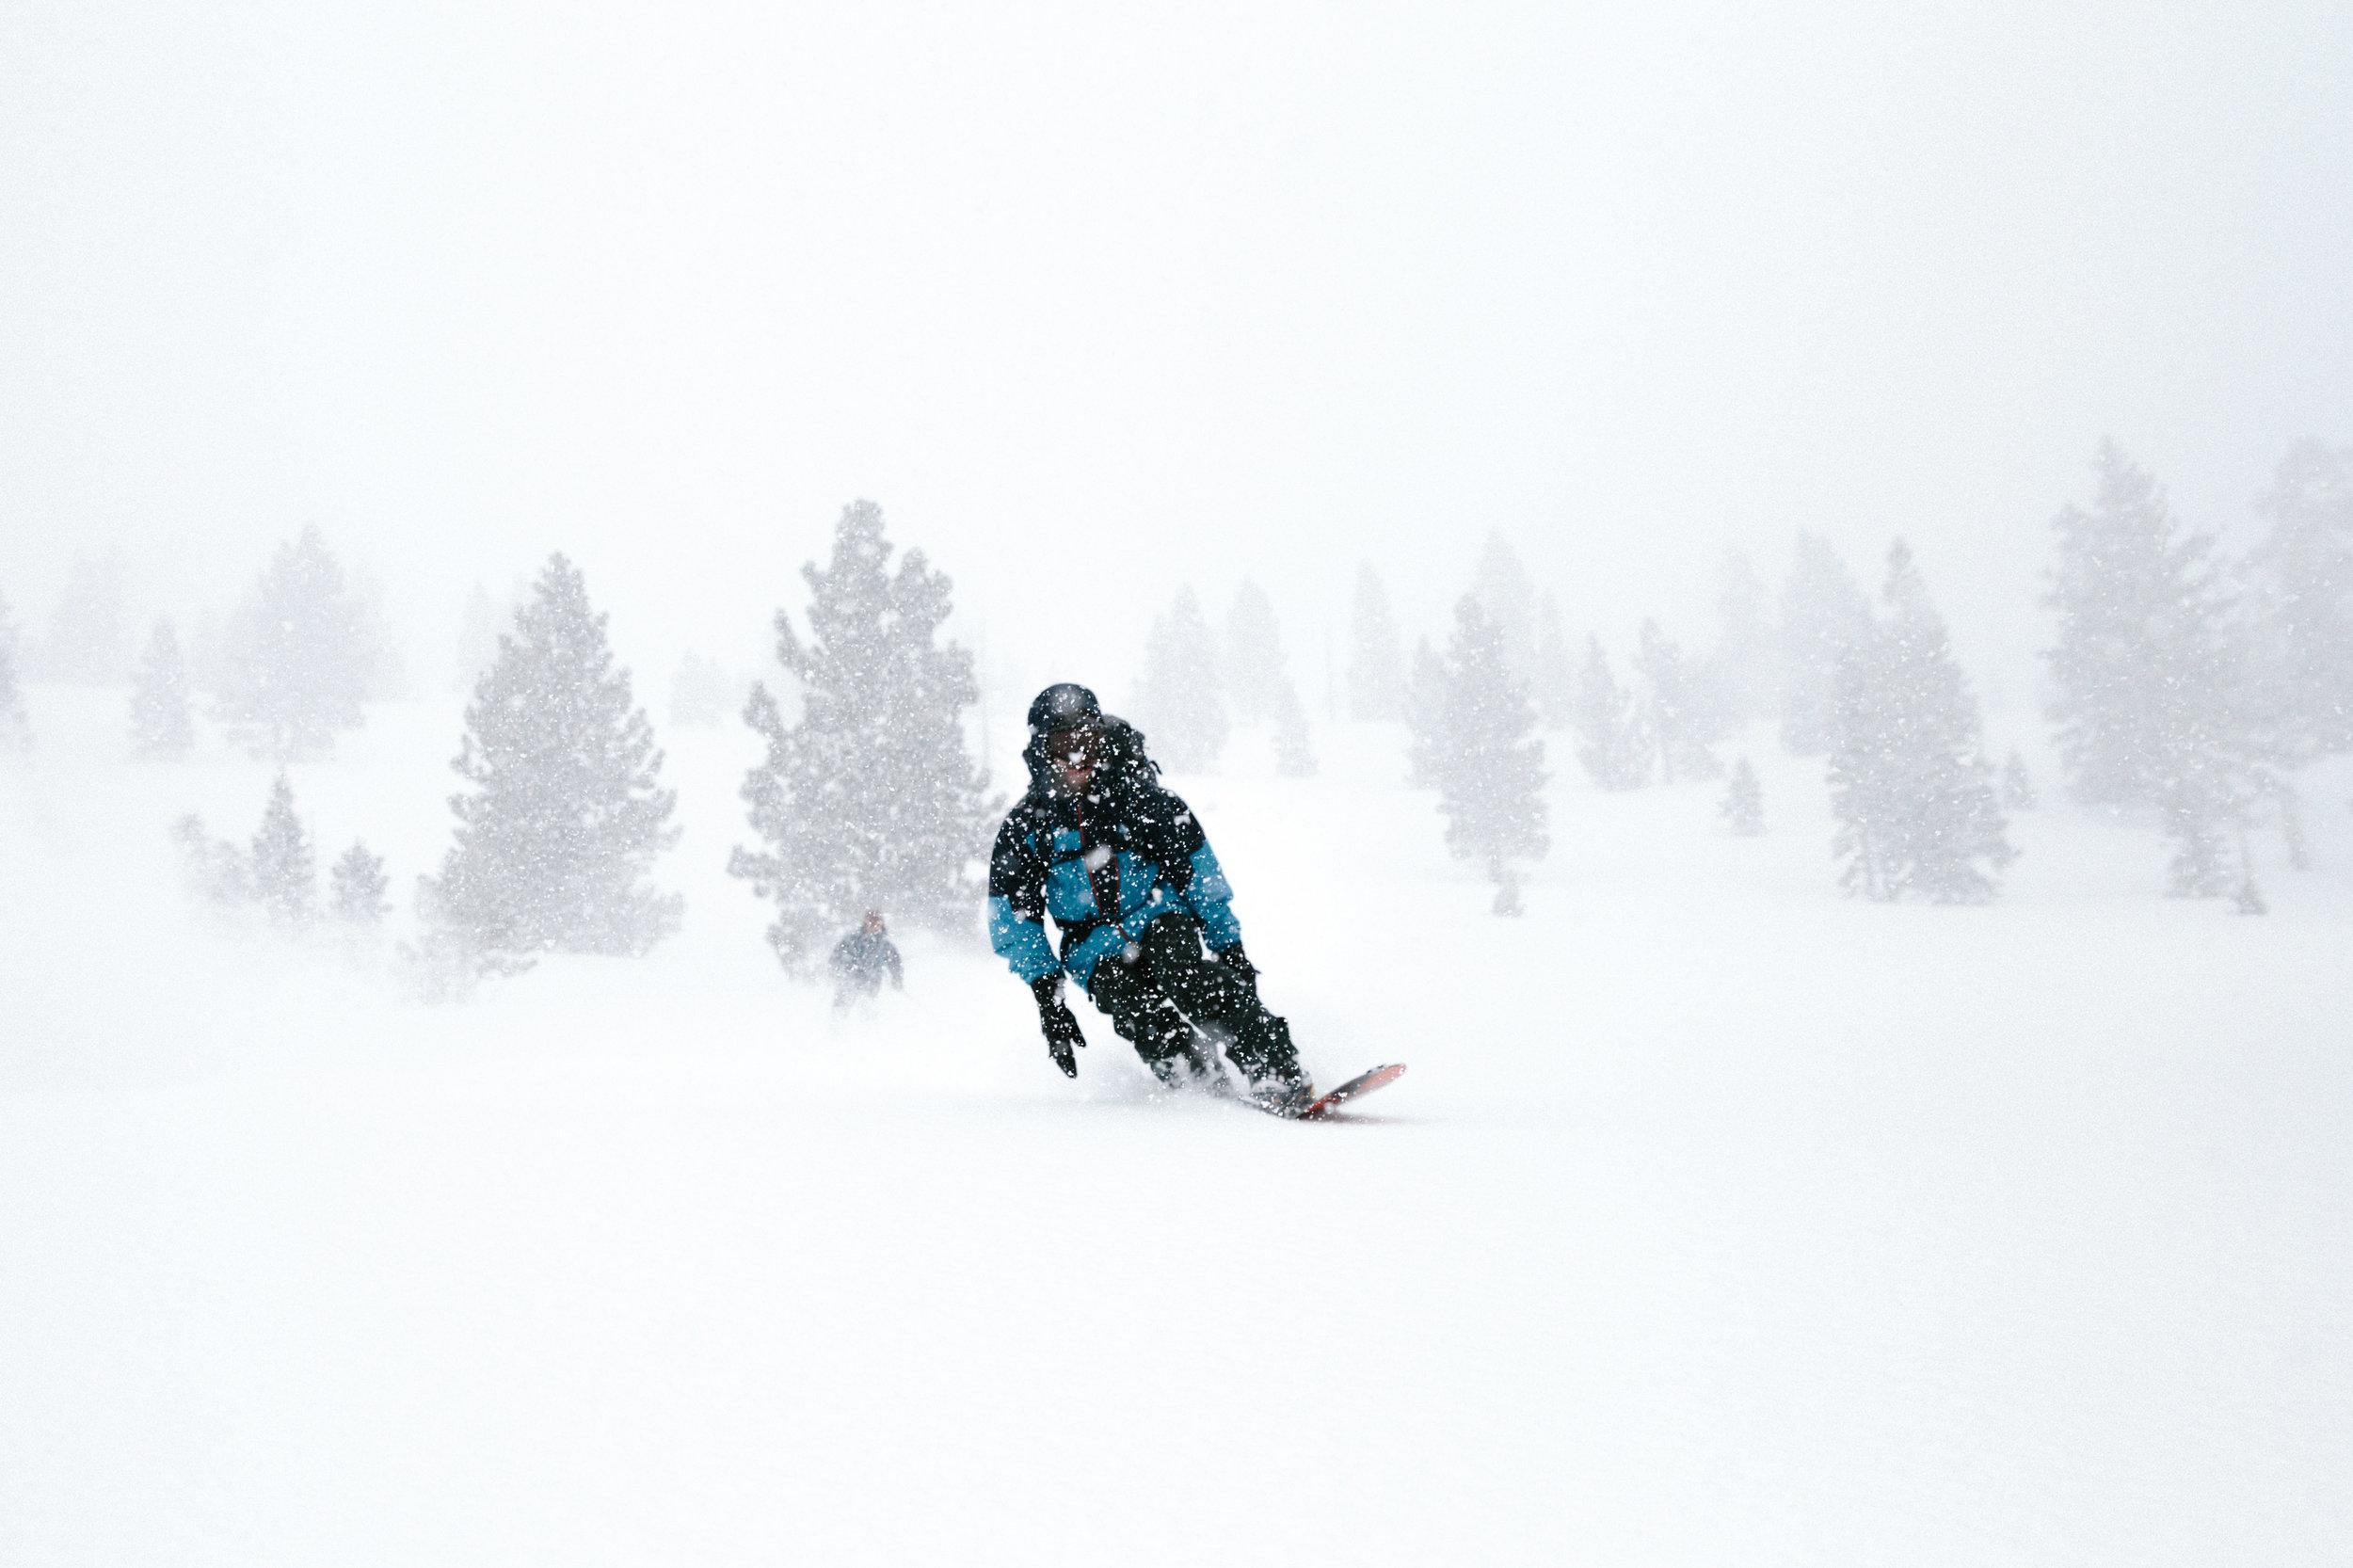 Snowboard through powder